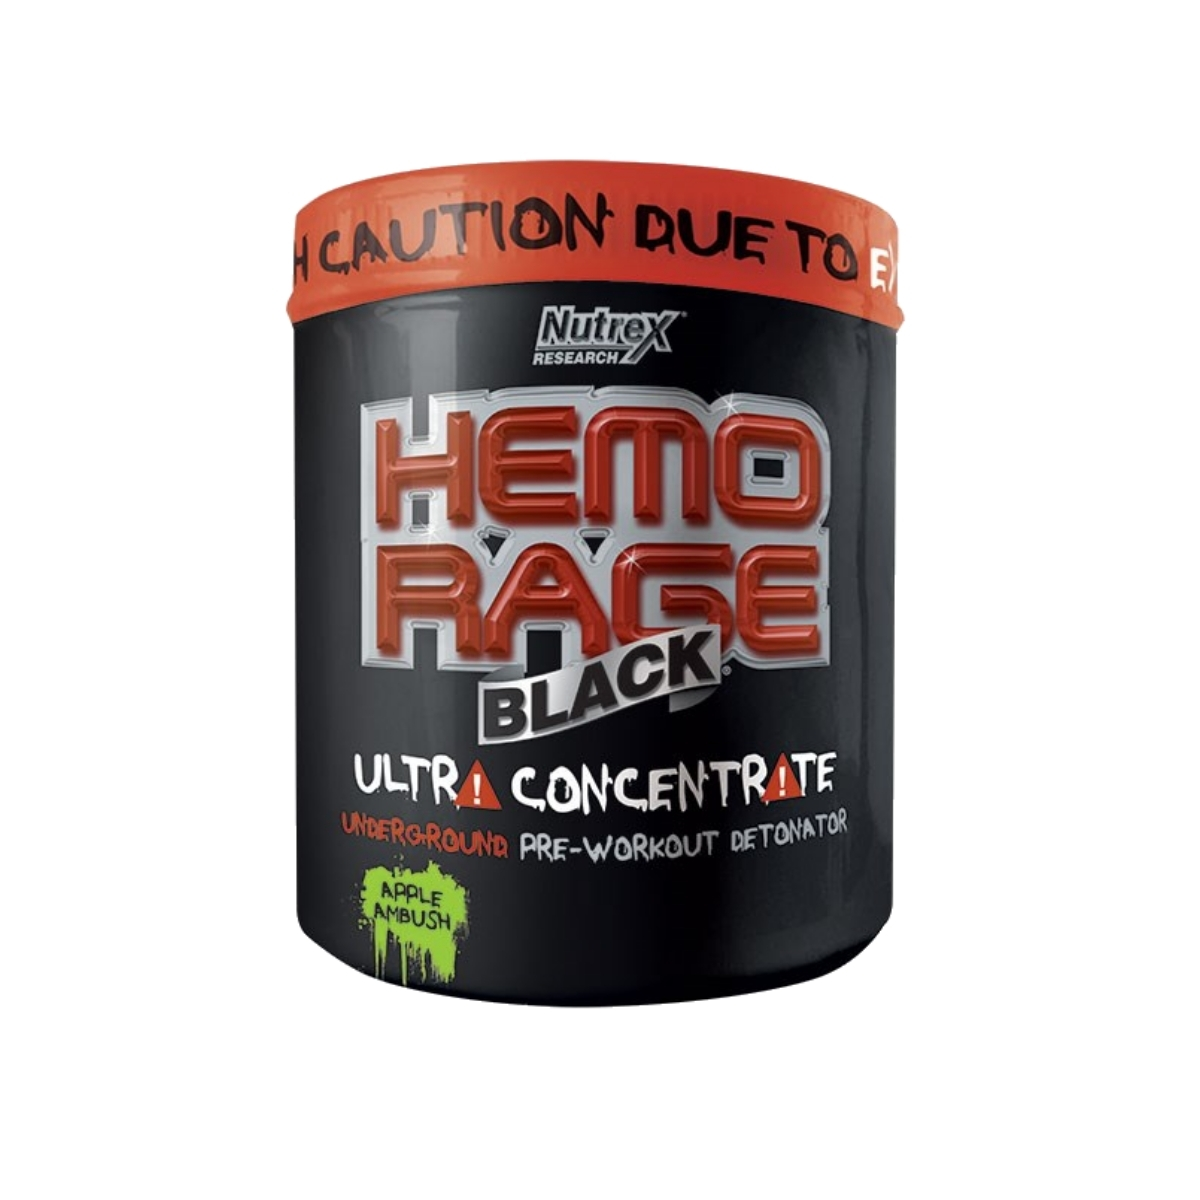 Hemo Rage Black UC 321 g - Nutrex